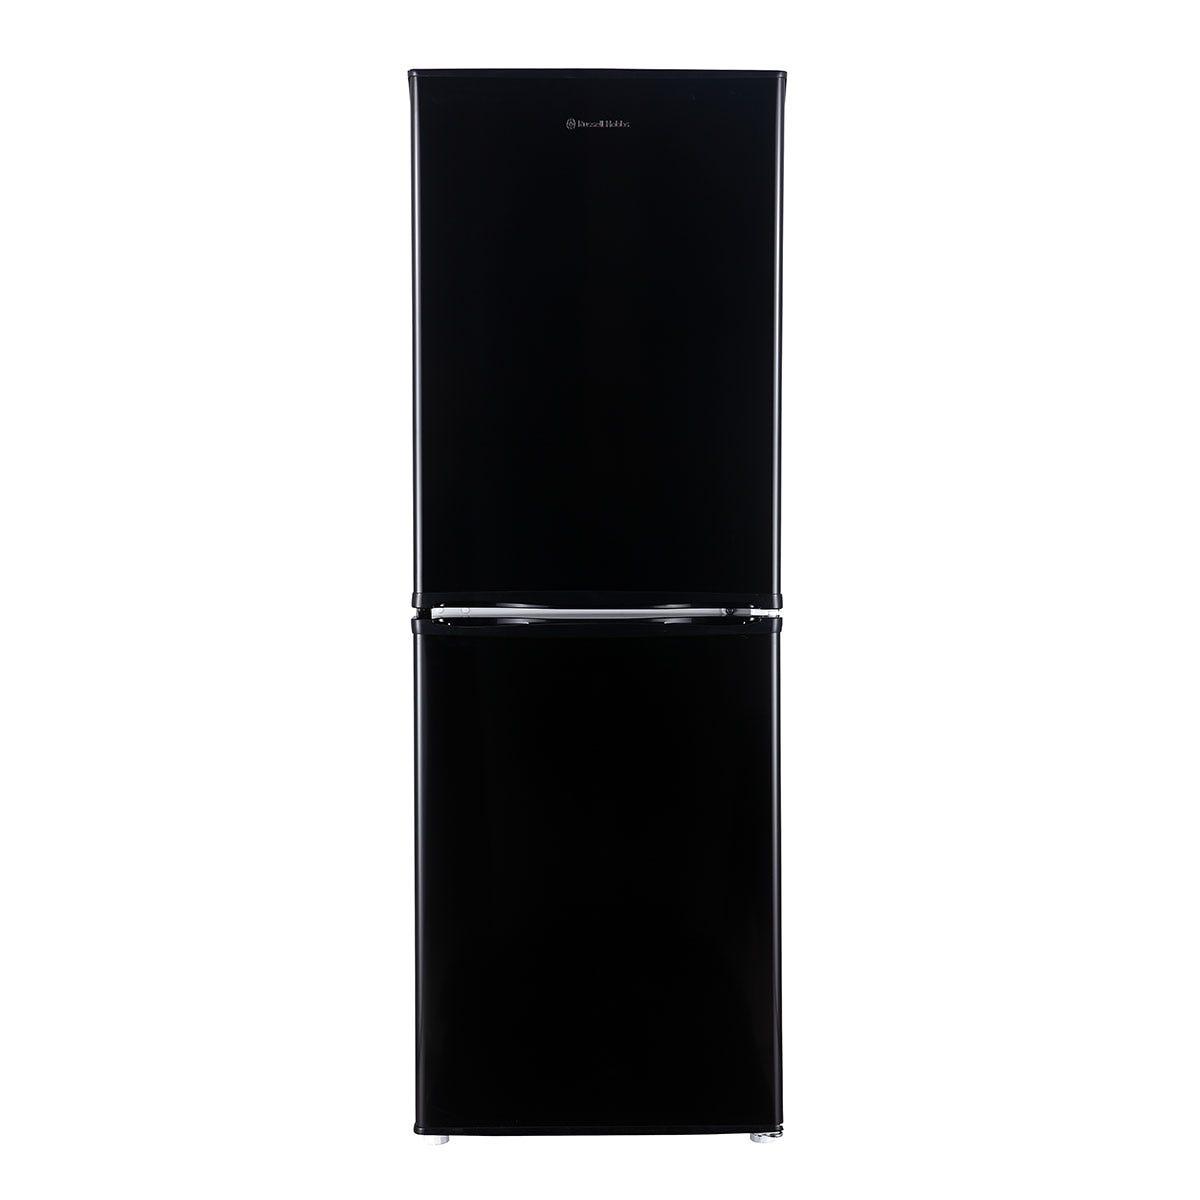 Russell Hobbs RH50FF144B 167L Freestanding Fridge Freezer - Black